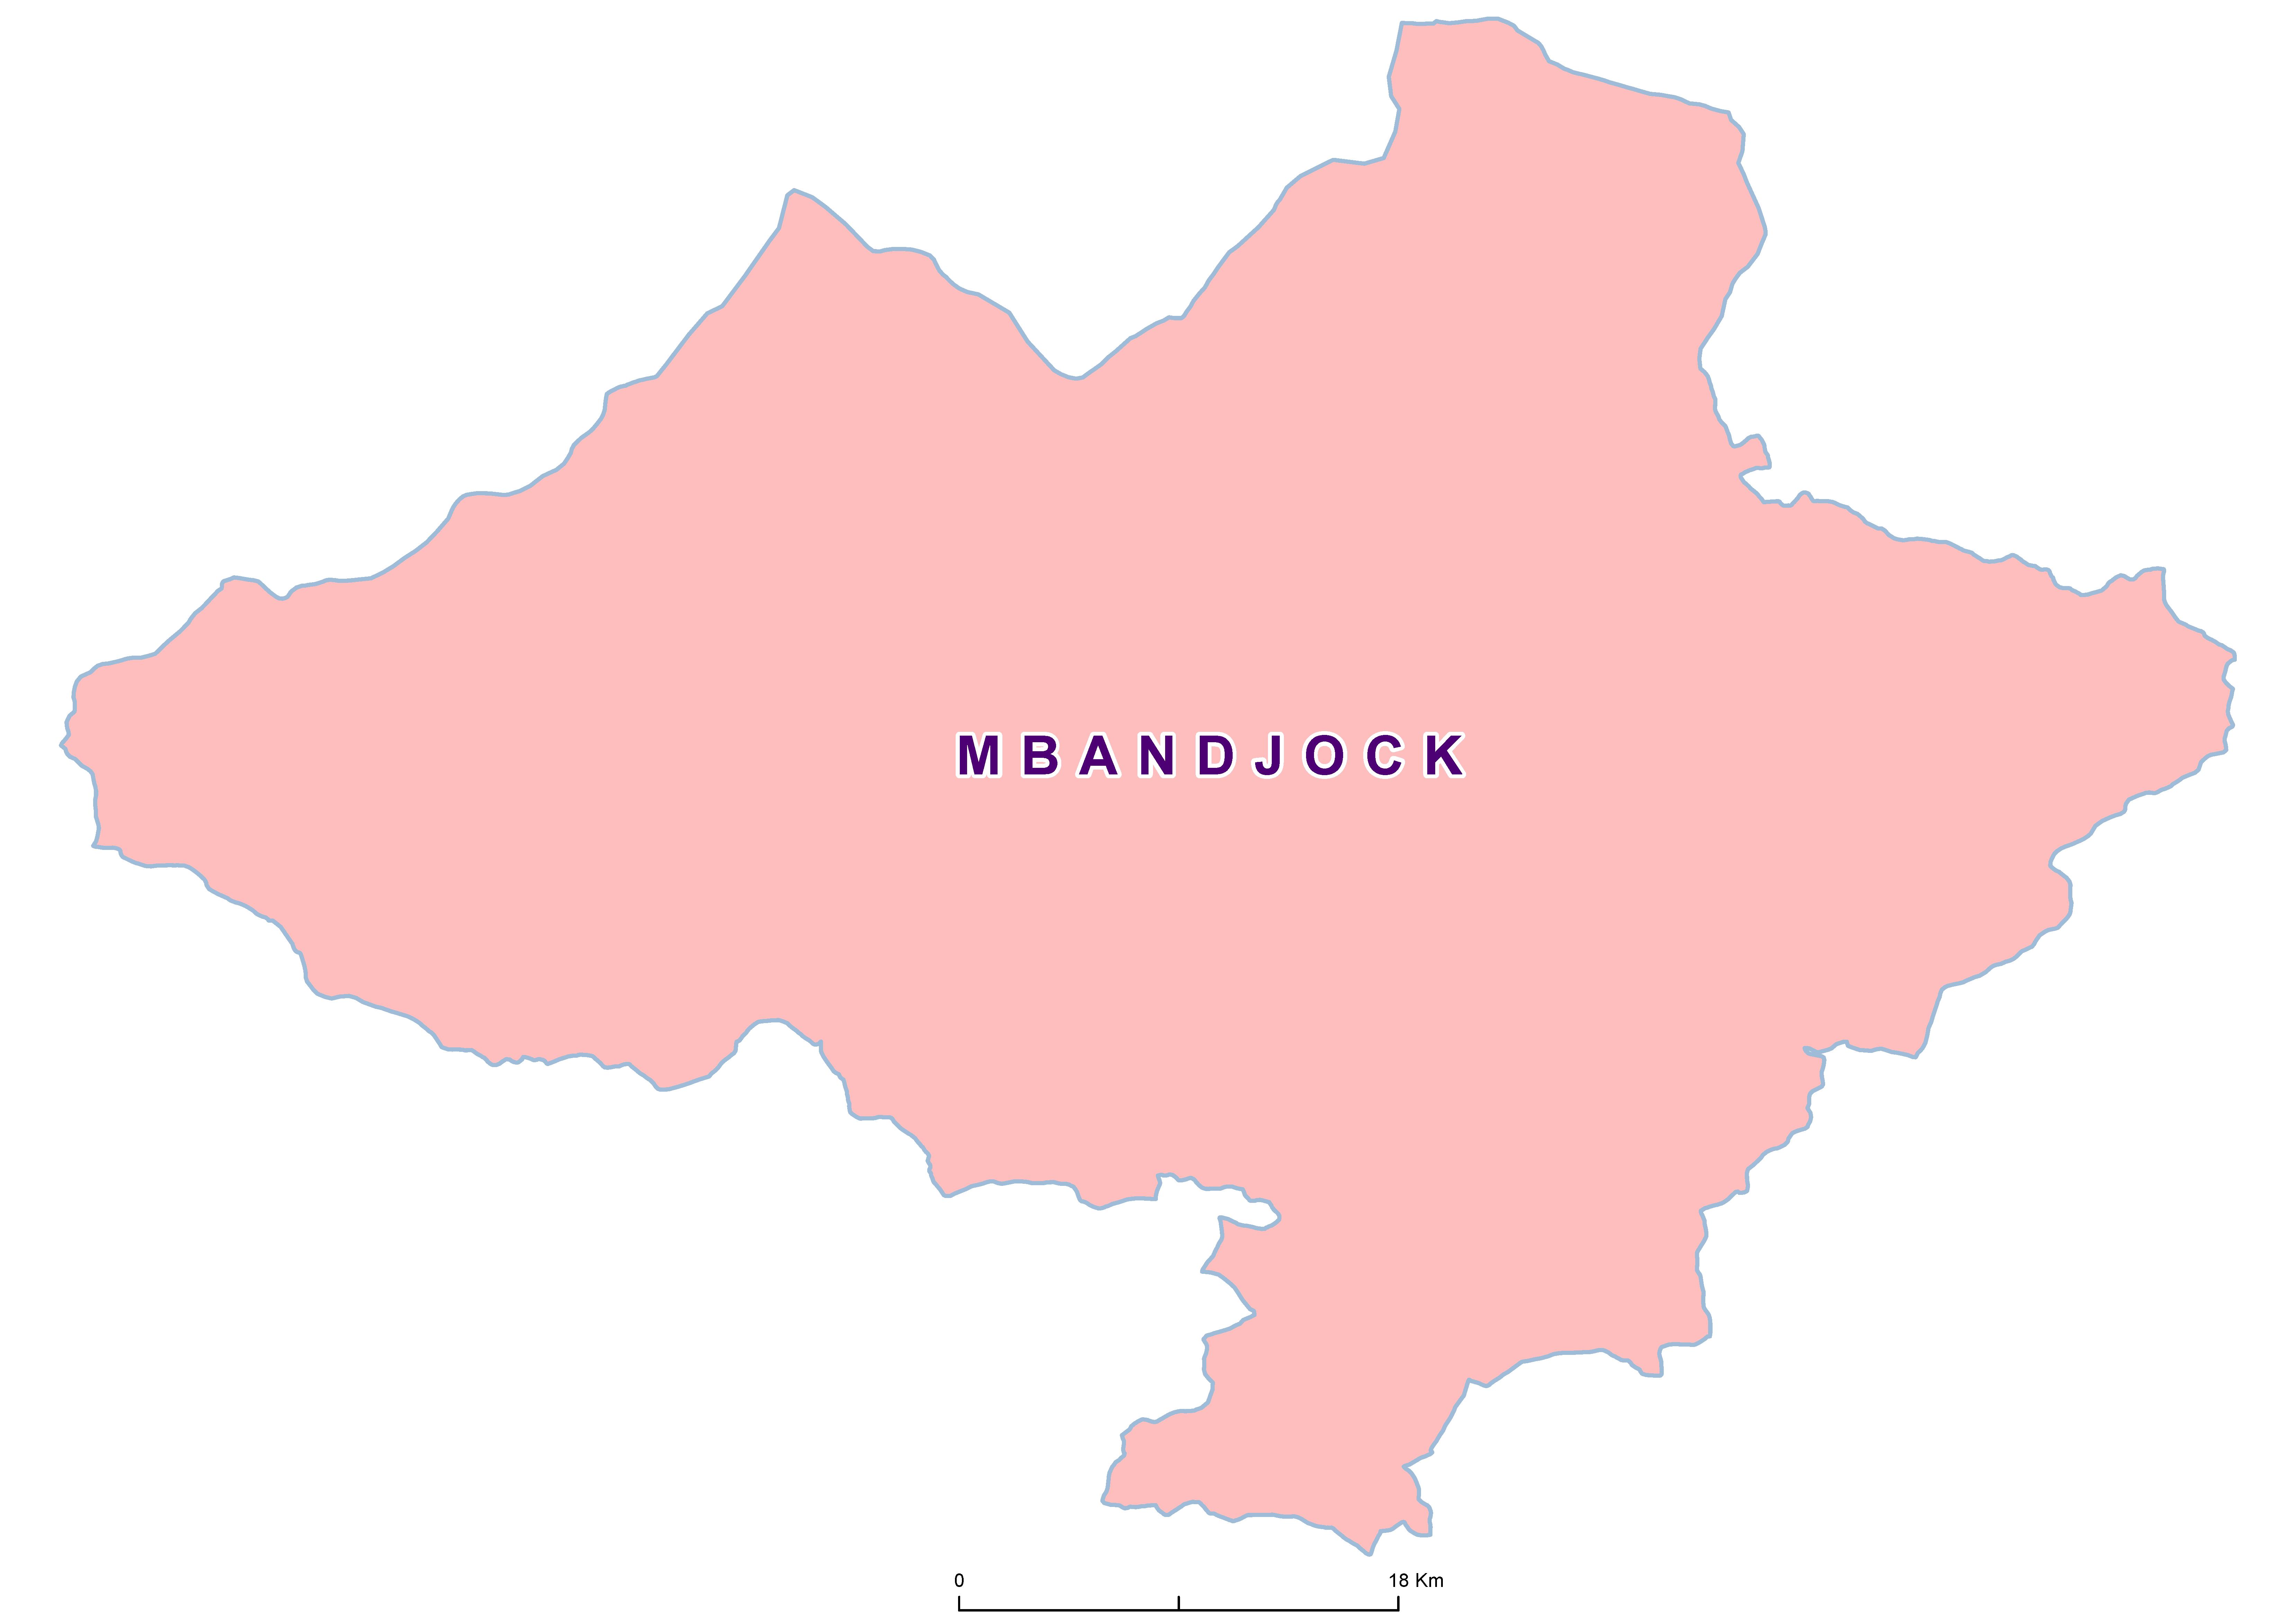 Mbandjock Mean SCH 19850001